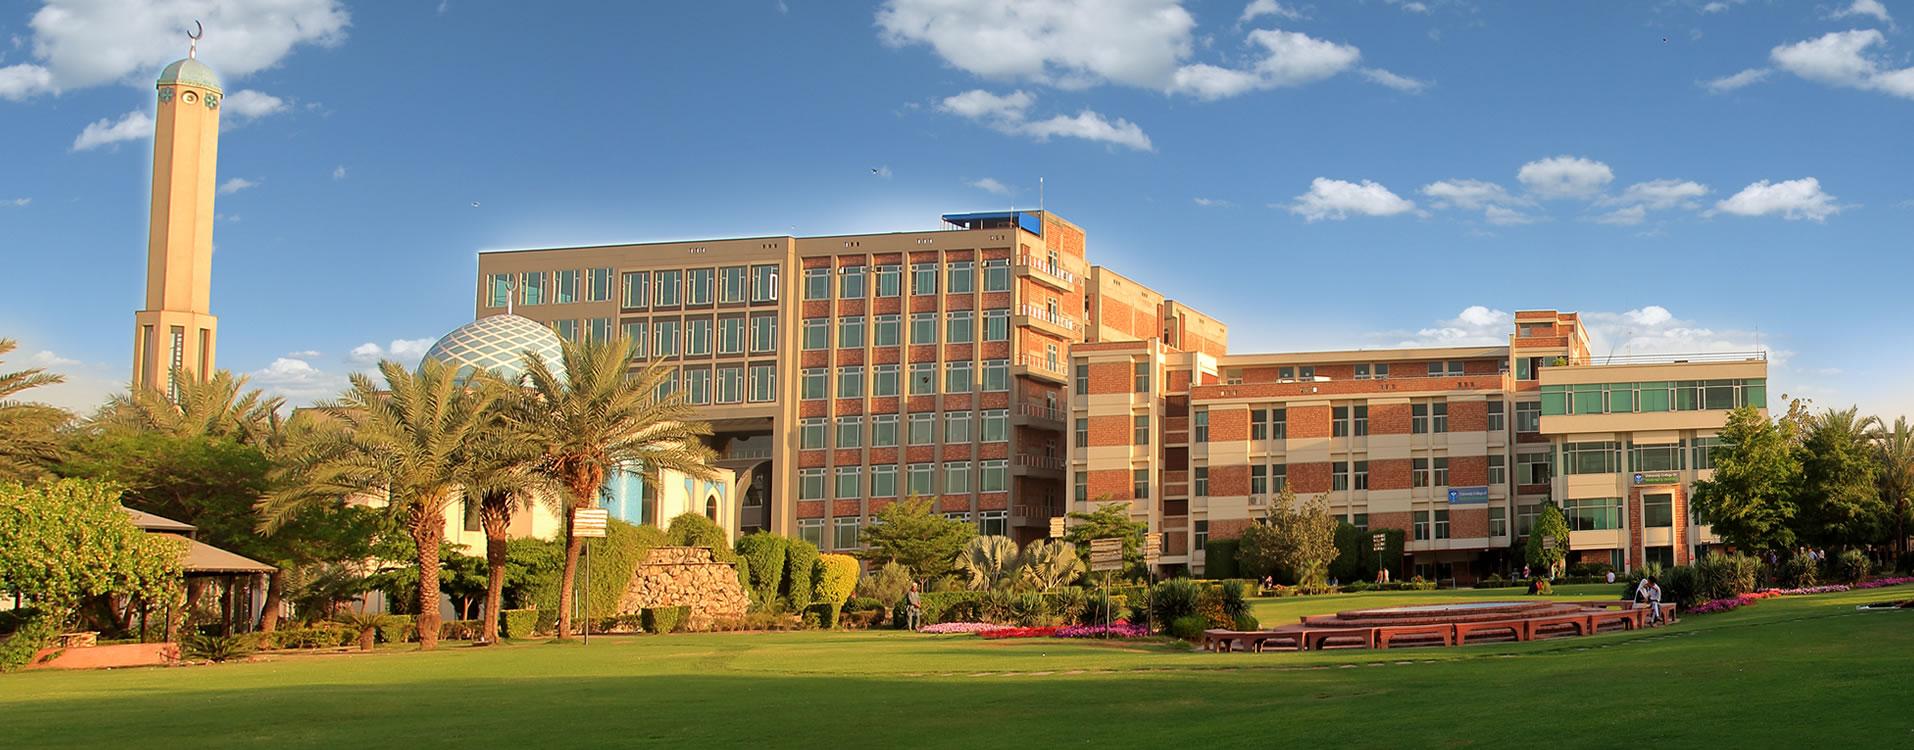 Hotels On University